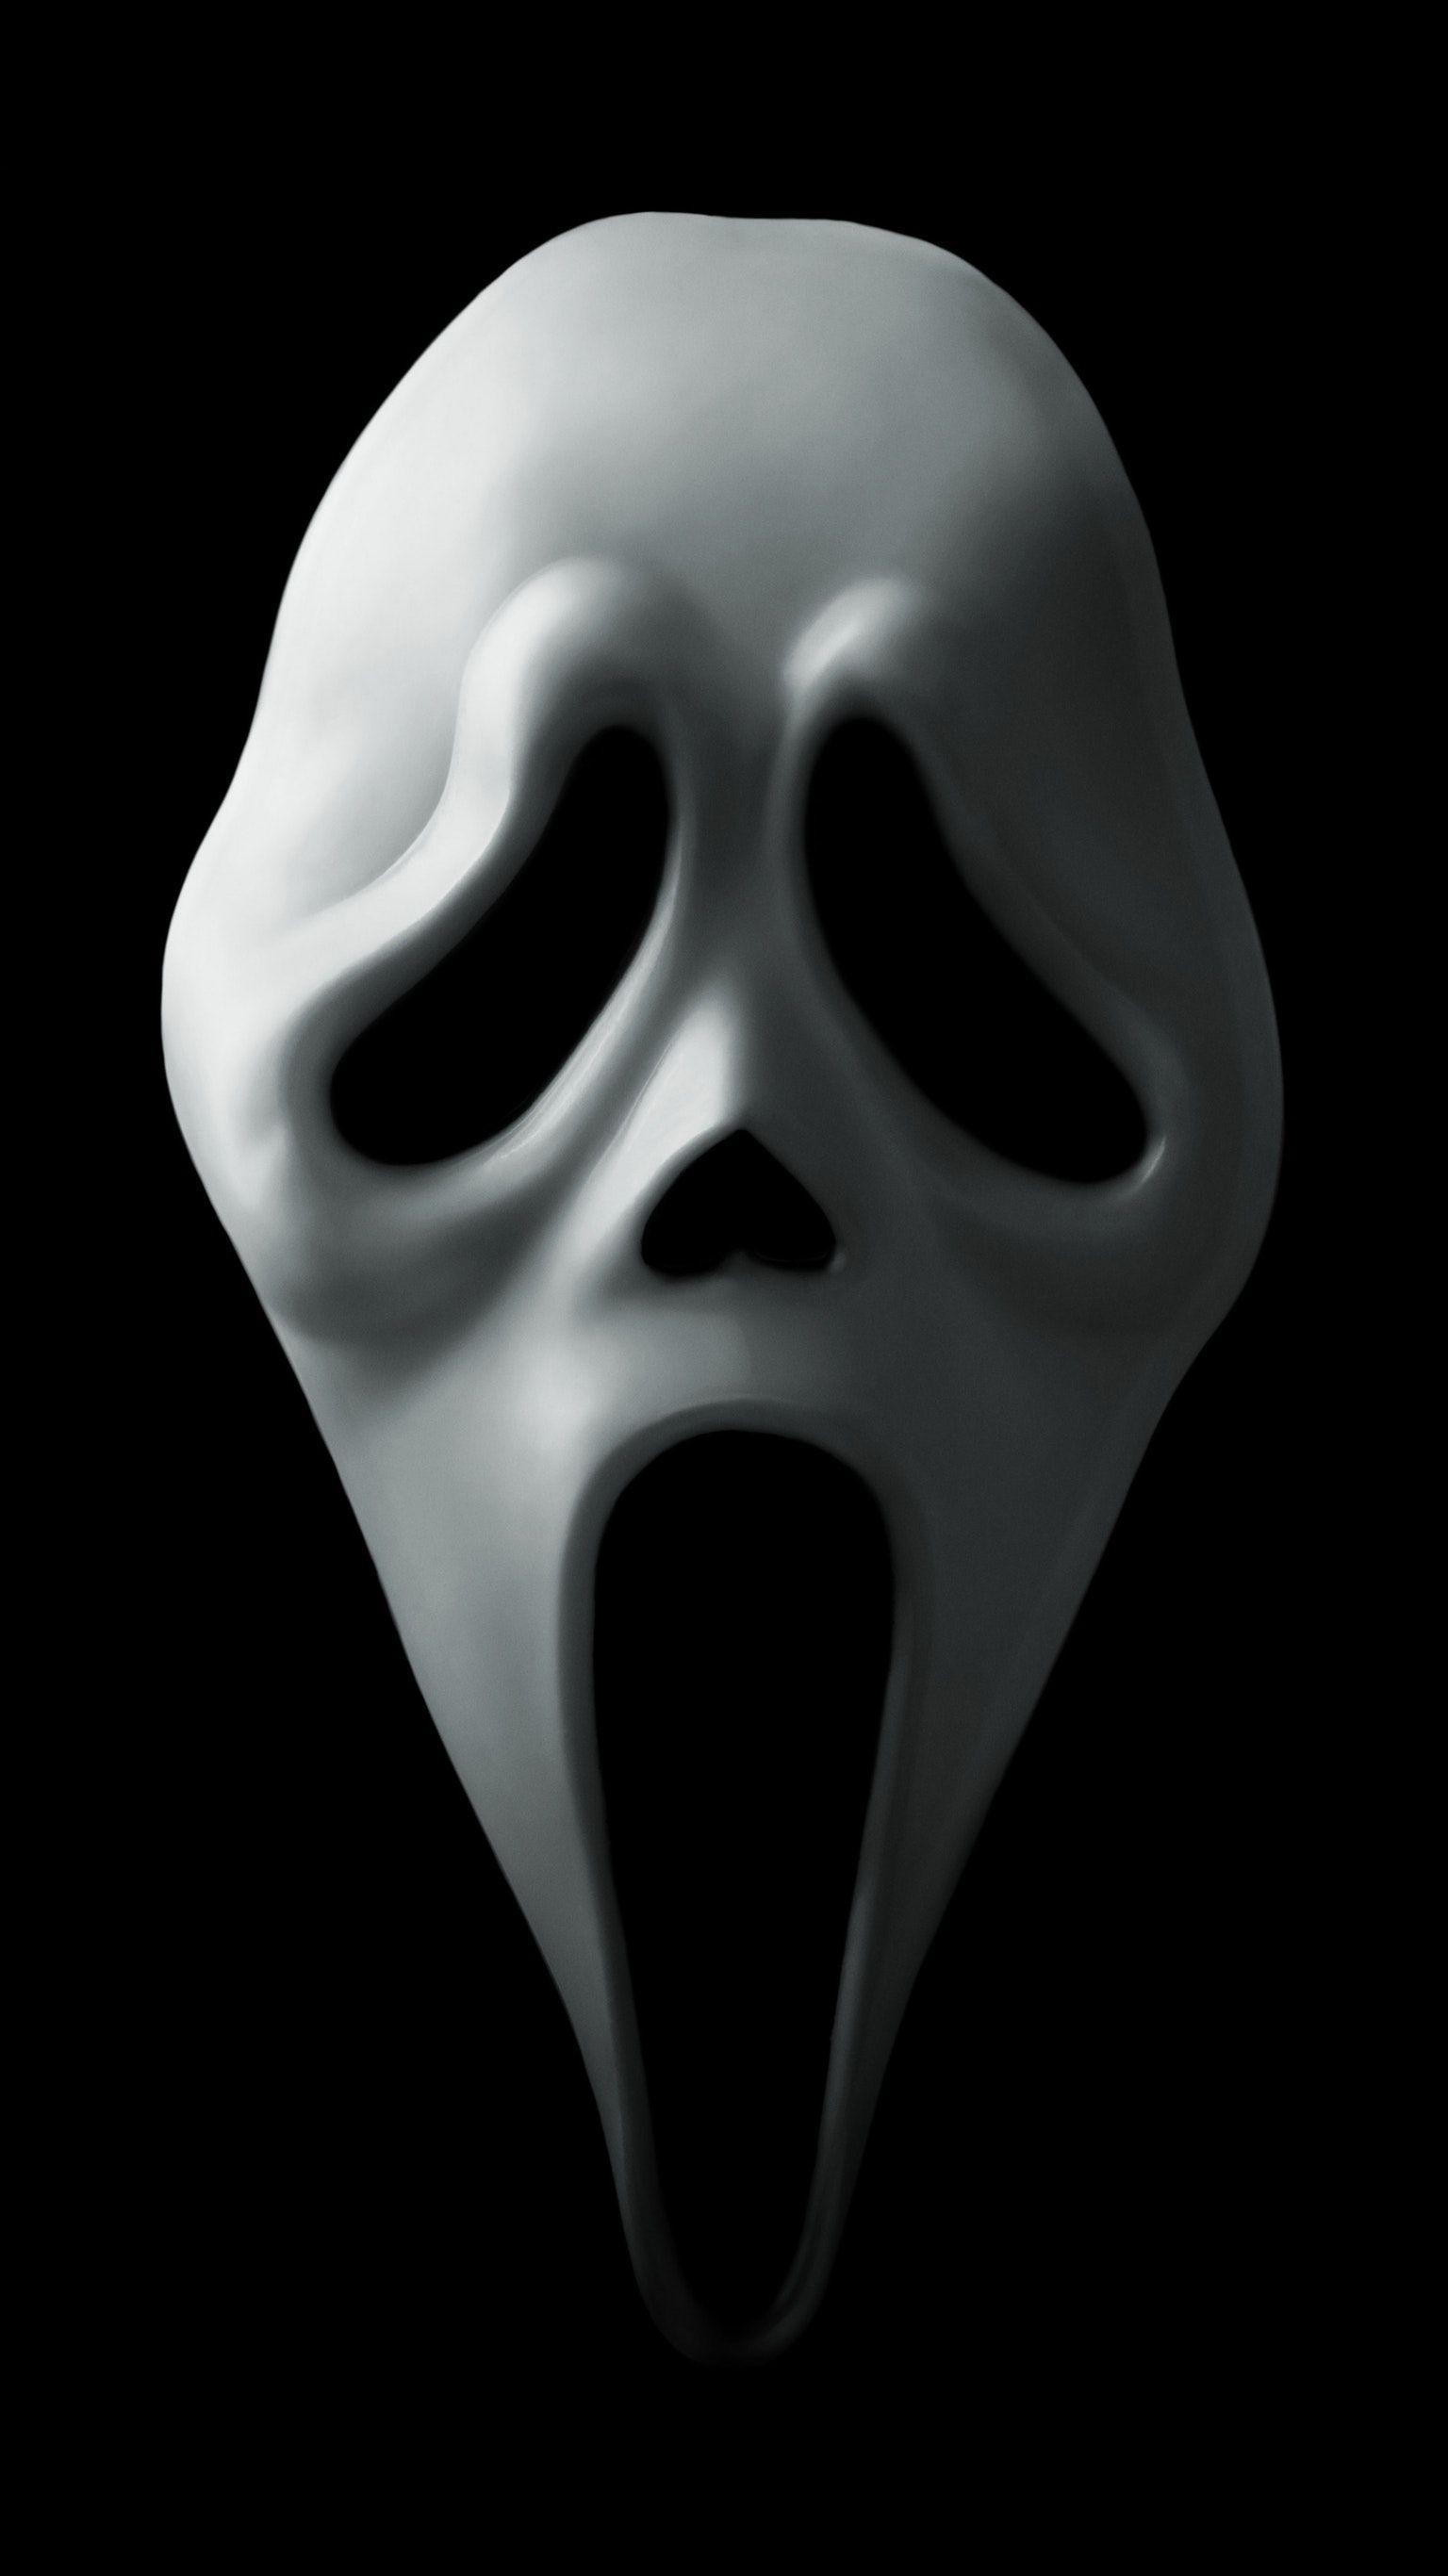 Scream 4 2011 Phone Wallpaper Filmes Classicos De Terror Terror Filmes